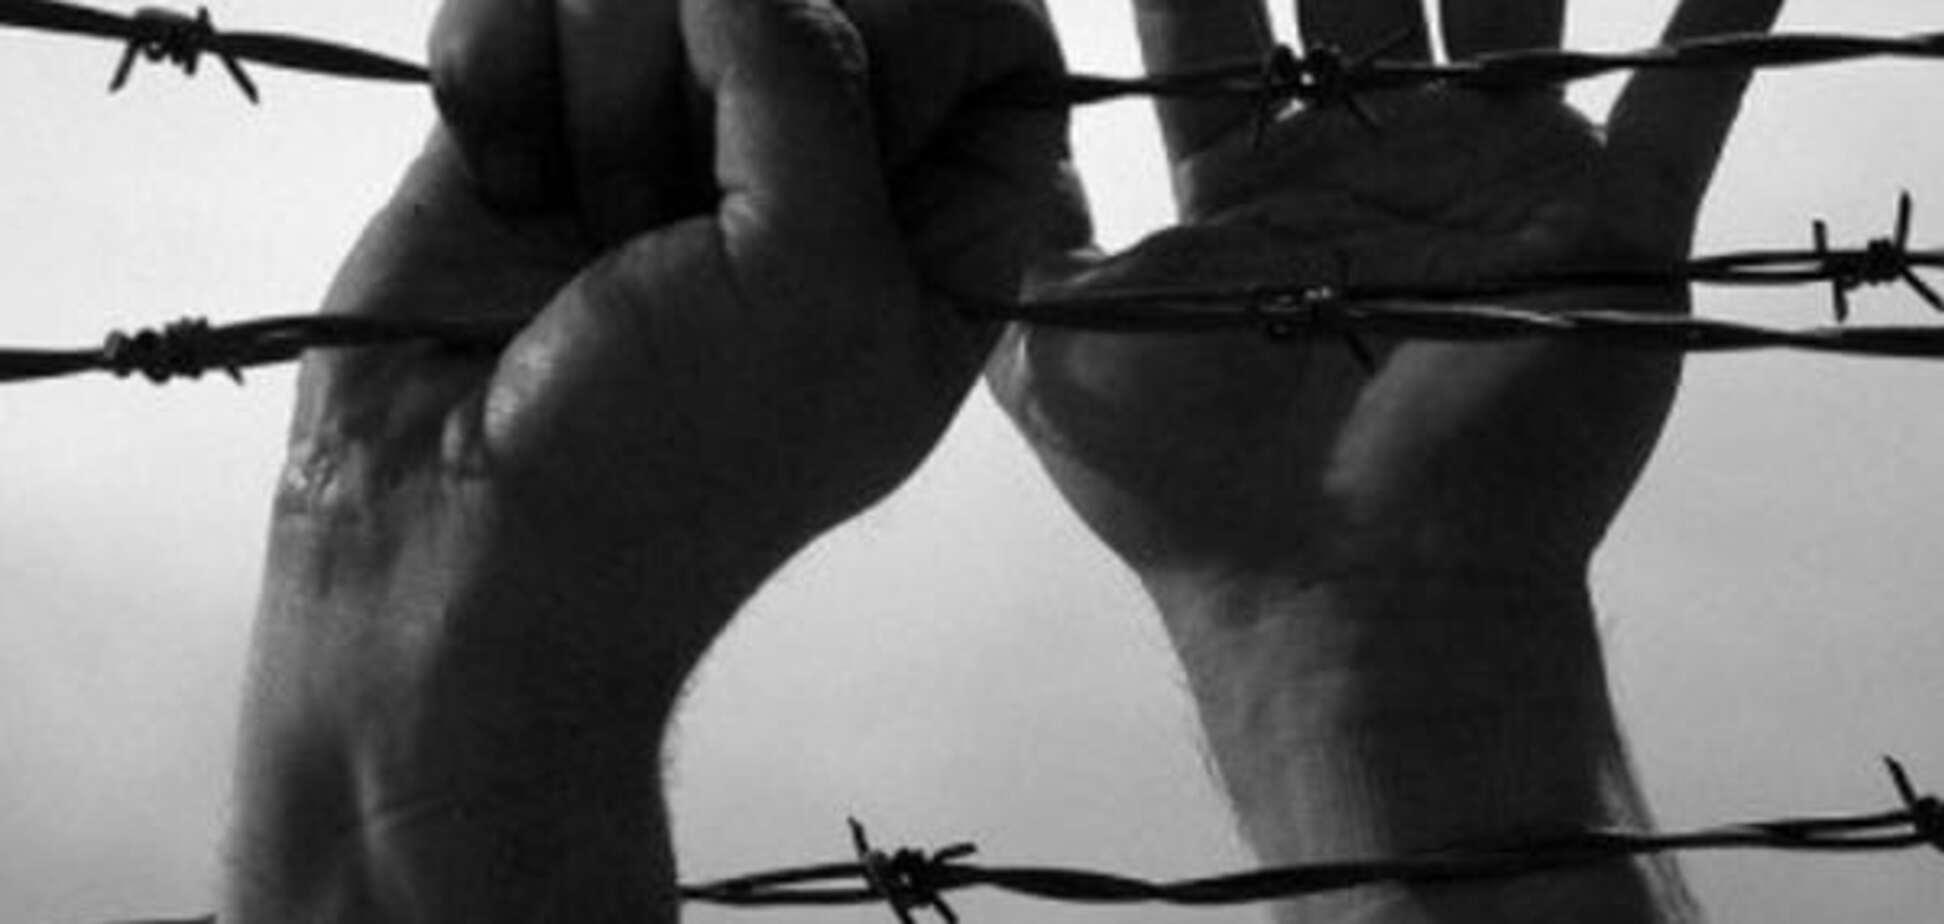 Свобода за ґратами